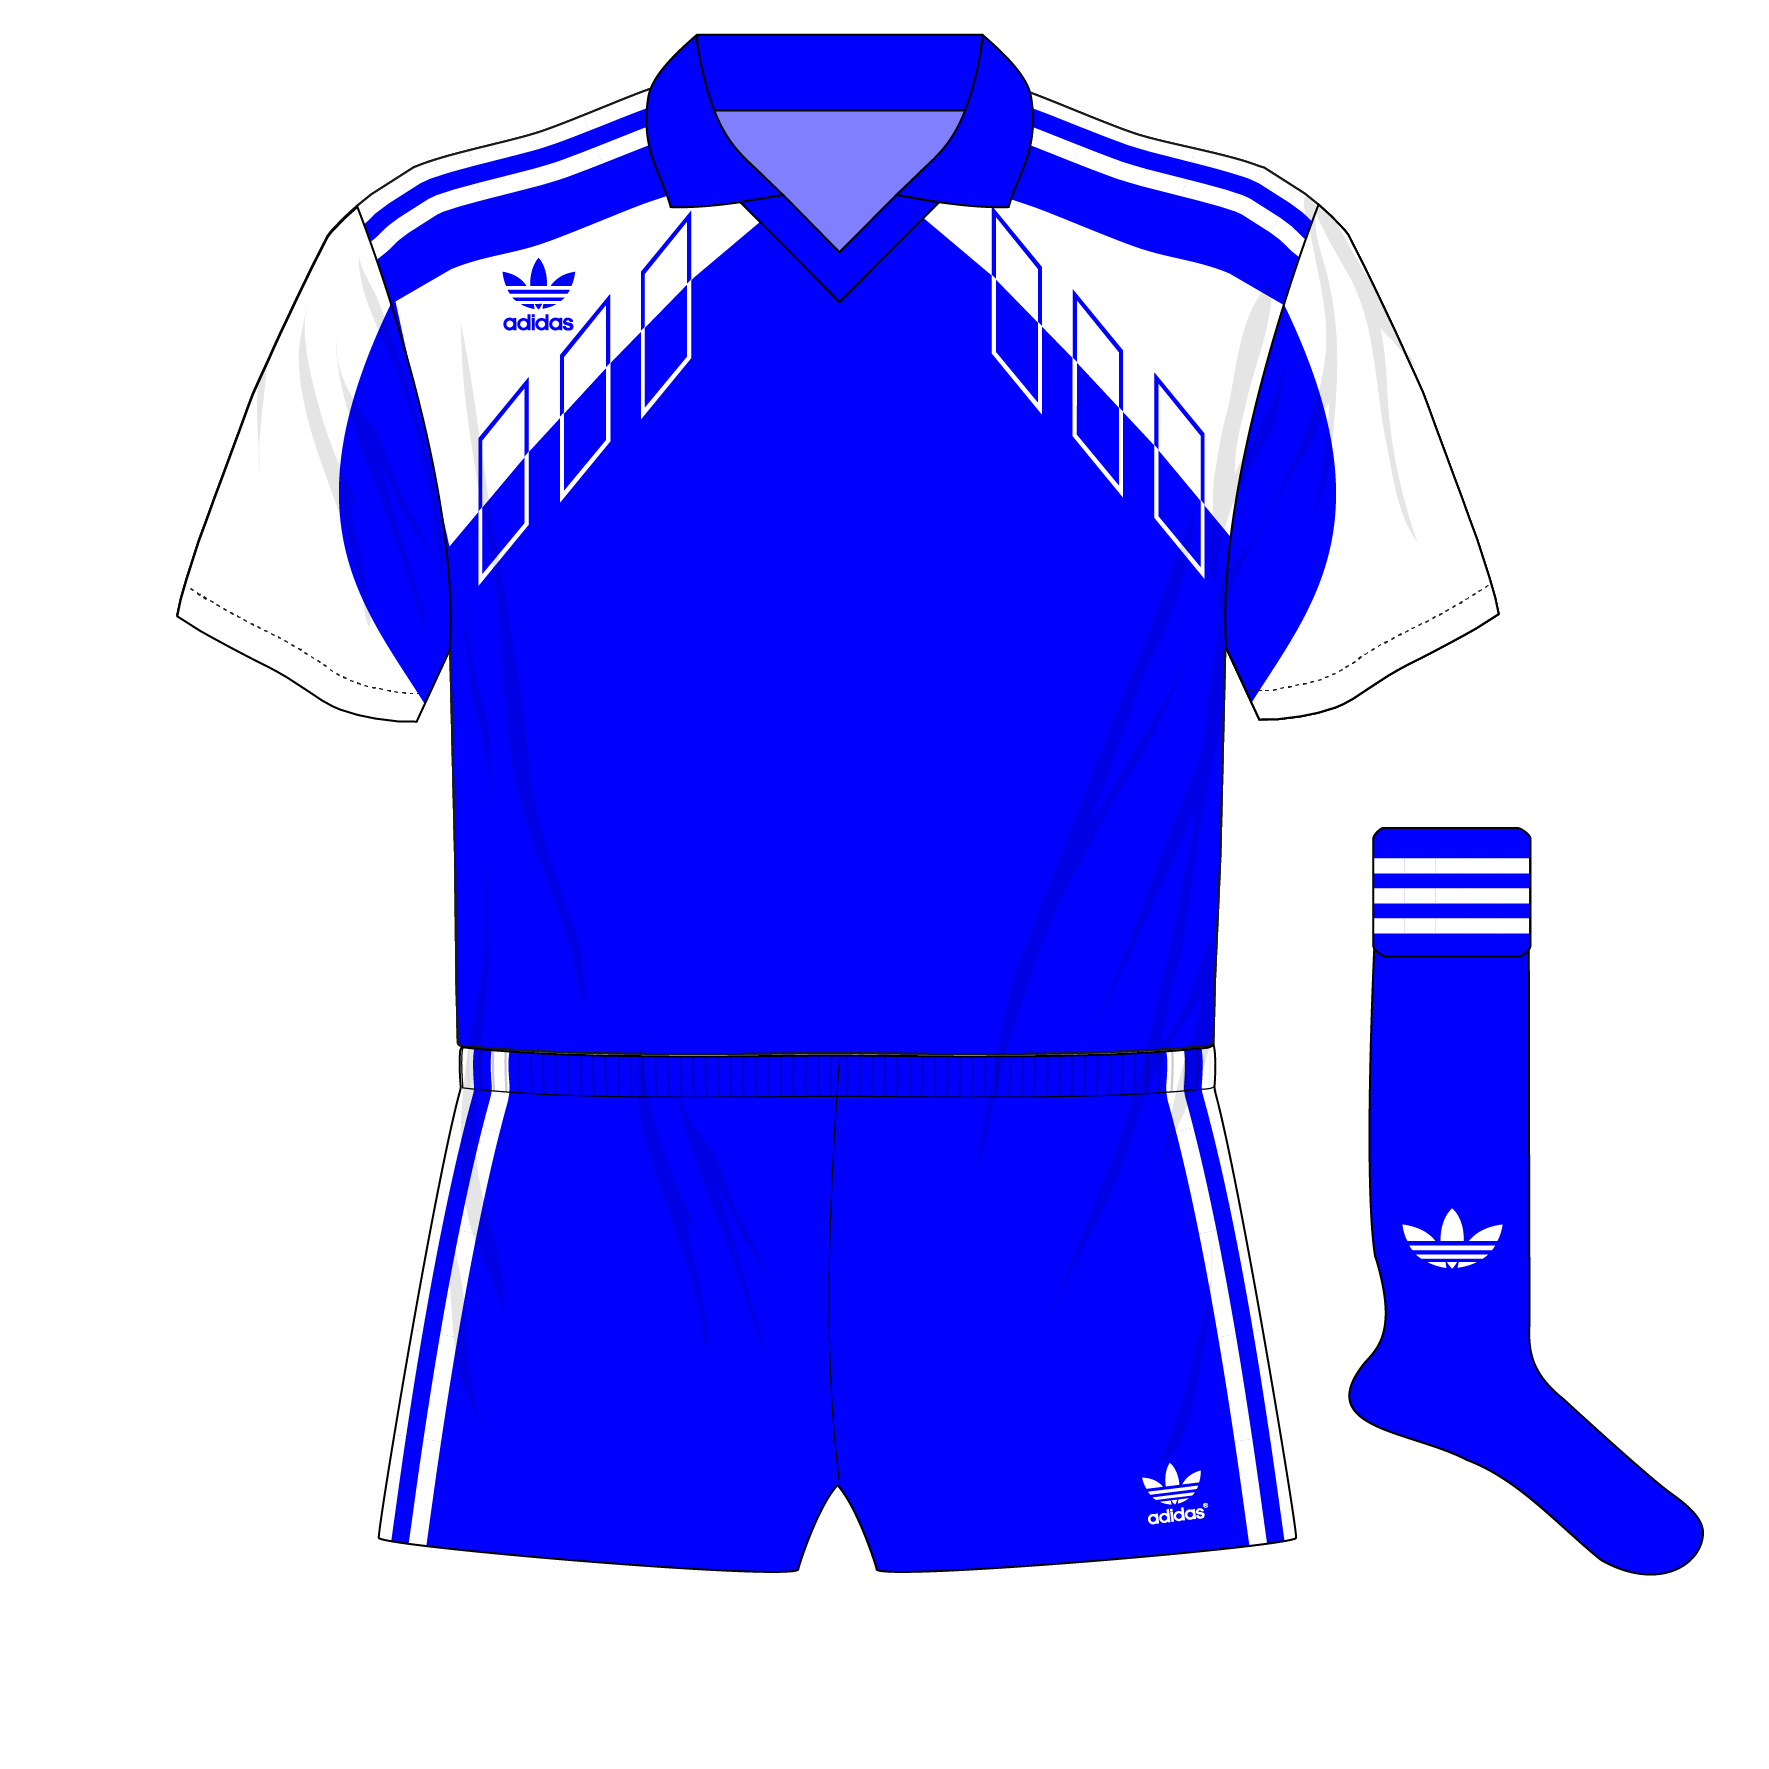 947bfa903 Romania-adidas-1990-blue-01  u2013 Museum of Jerseys